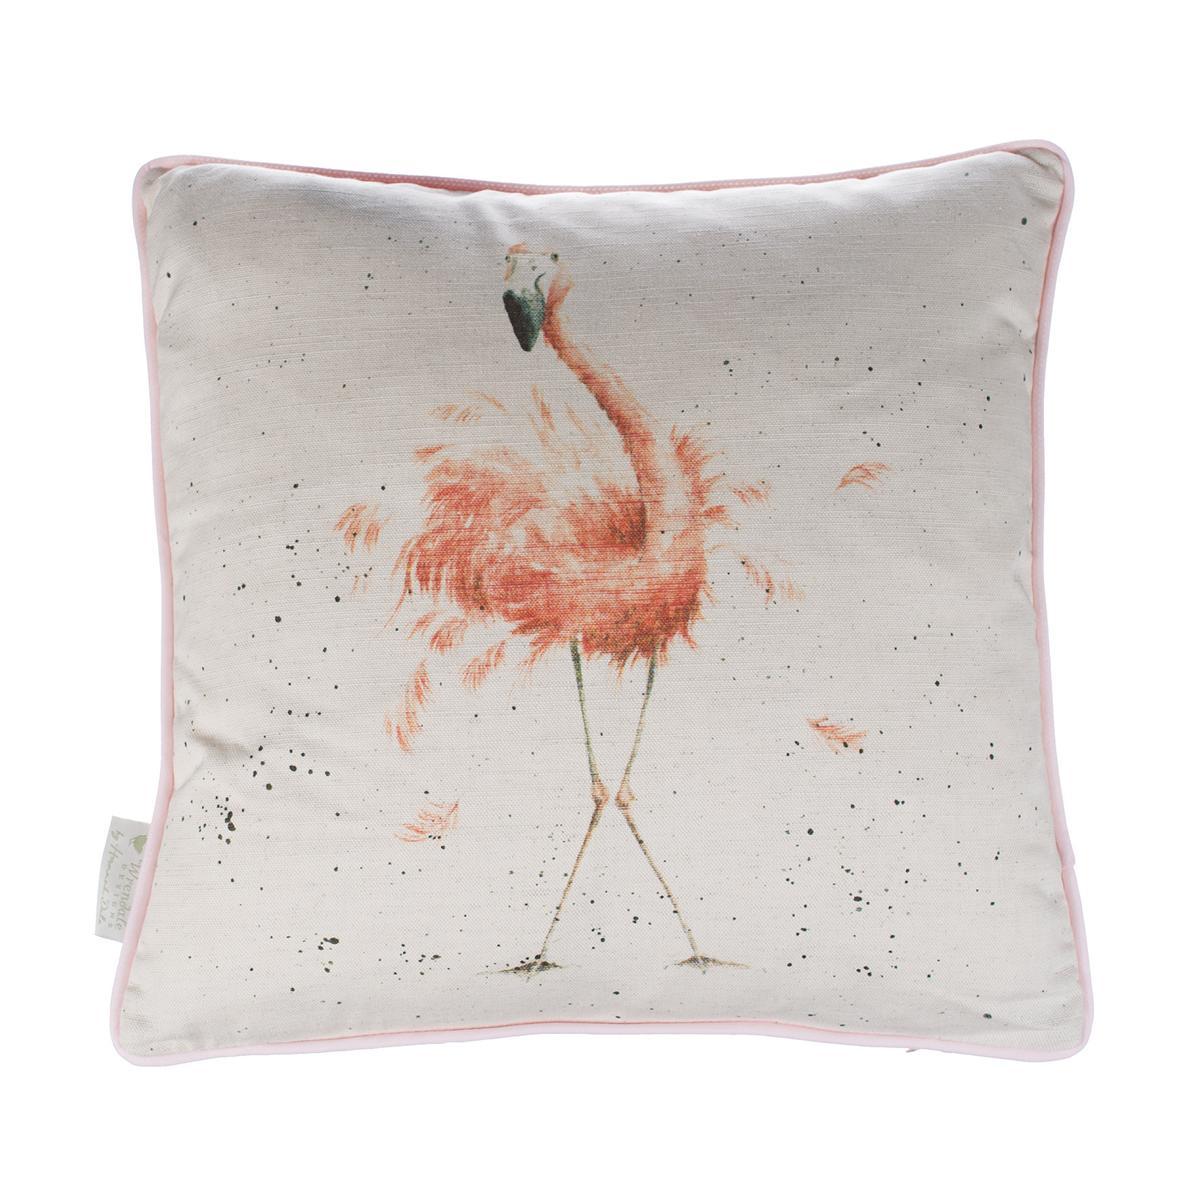 Wrendale Kissen inkl. Füllung, Motiv Flamingo, 40x40cm